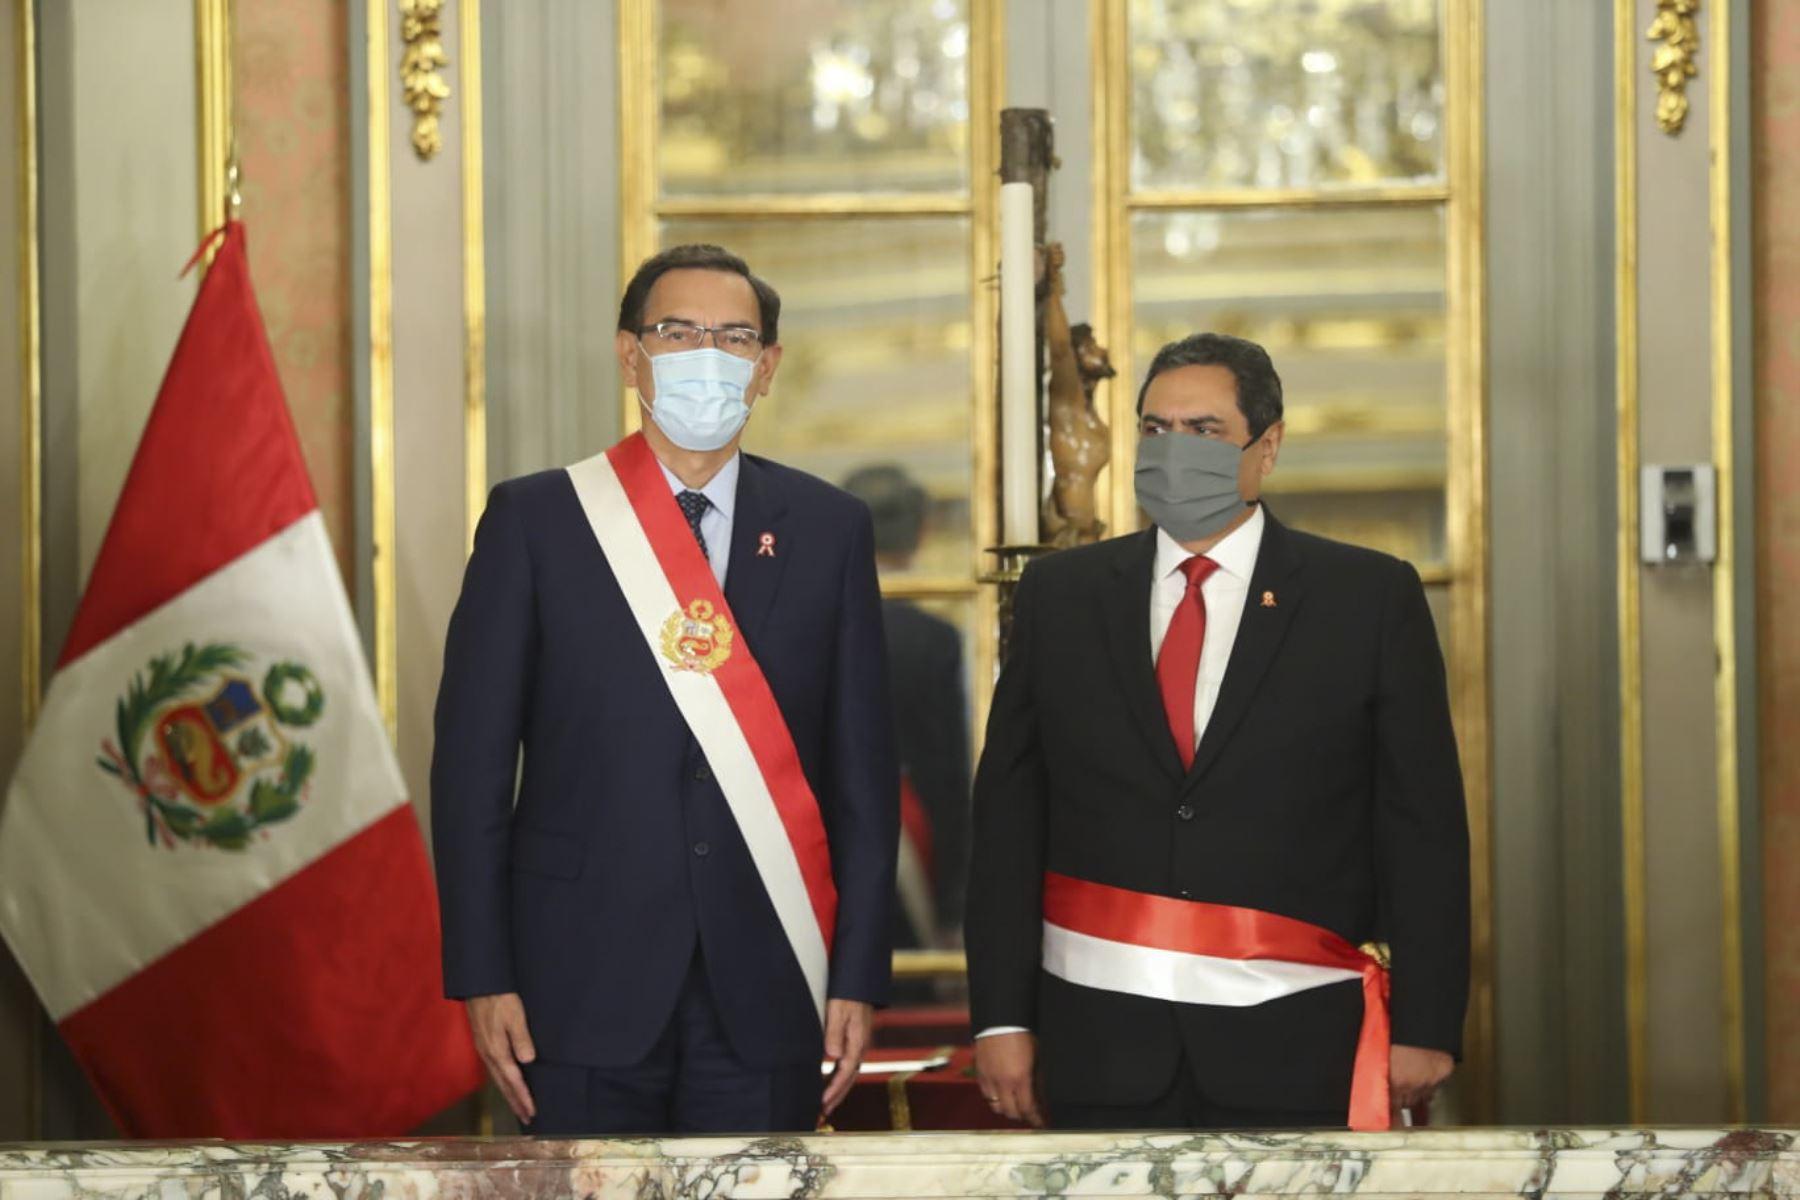 Presidente Martín Vizcarra toma juramento a Jorge Montoya como ministro del Interior. Foto: ANDINA/Prensa Presidencia